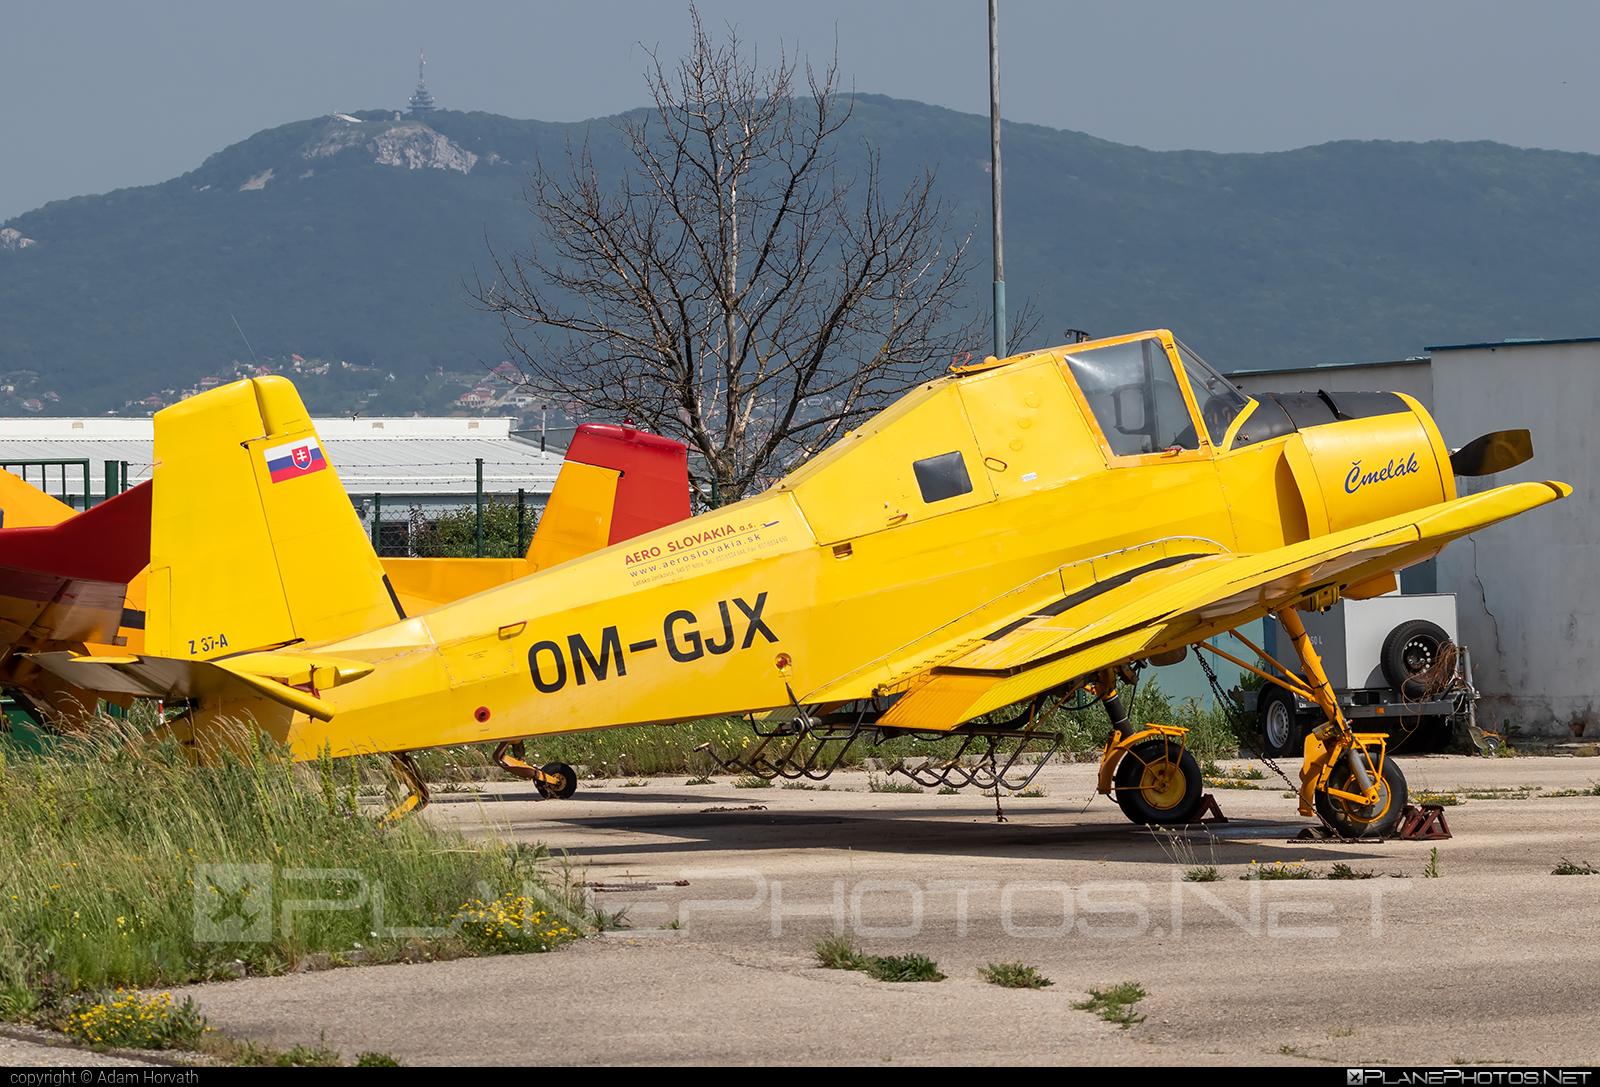 Zlin Z-37A Čmelák - OM-GJX operated by AERO SLOVAKIA #aeroslovakia #cmelak #z37 #z37a #zlin #zlin37 #zlin37cmelak